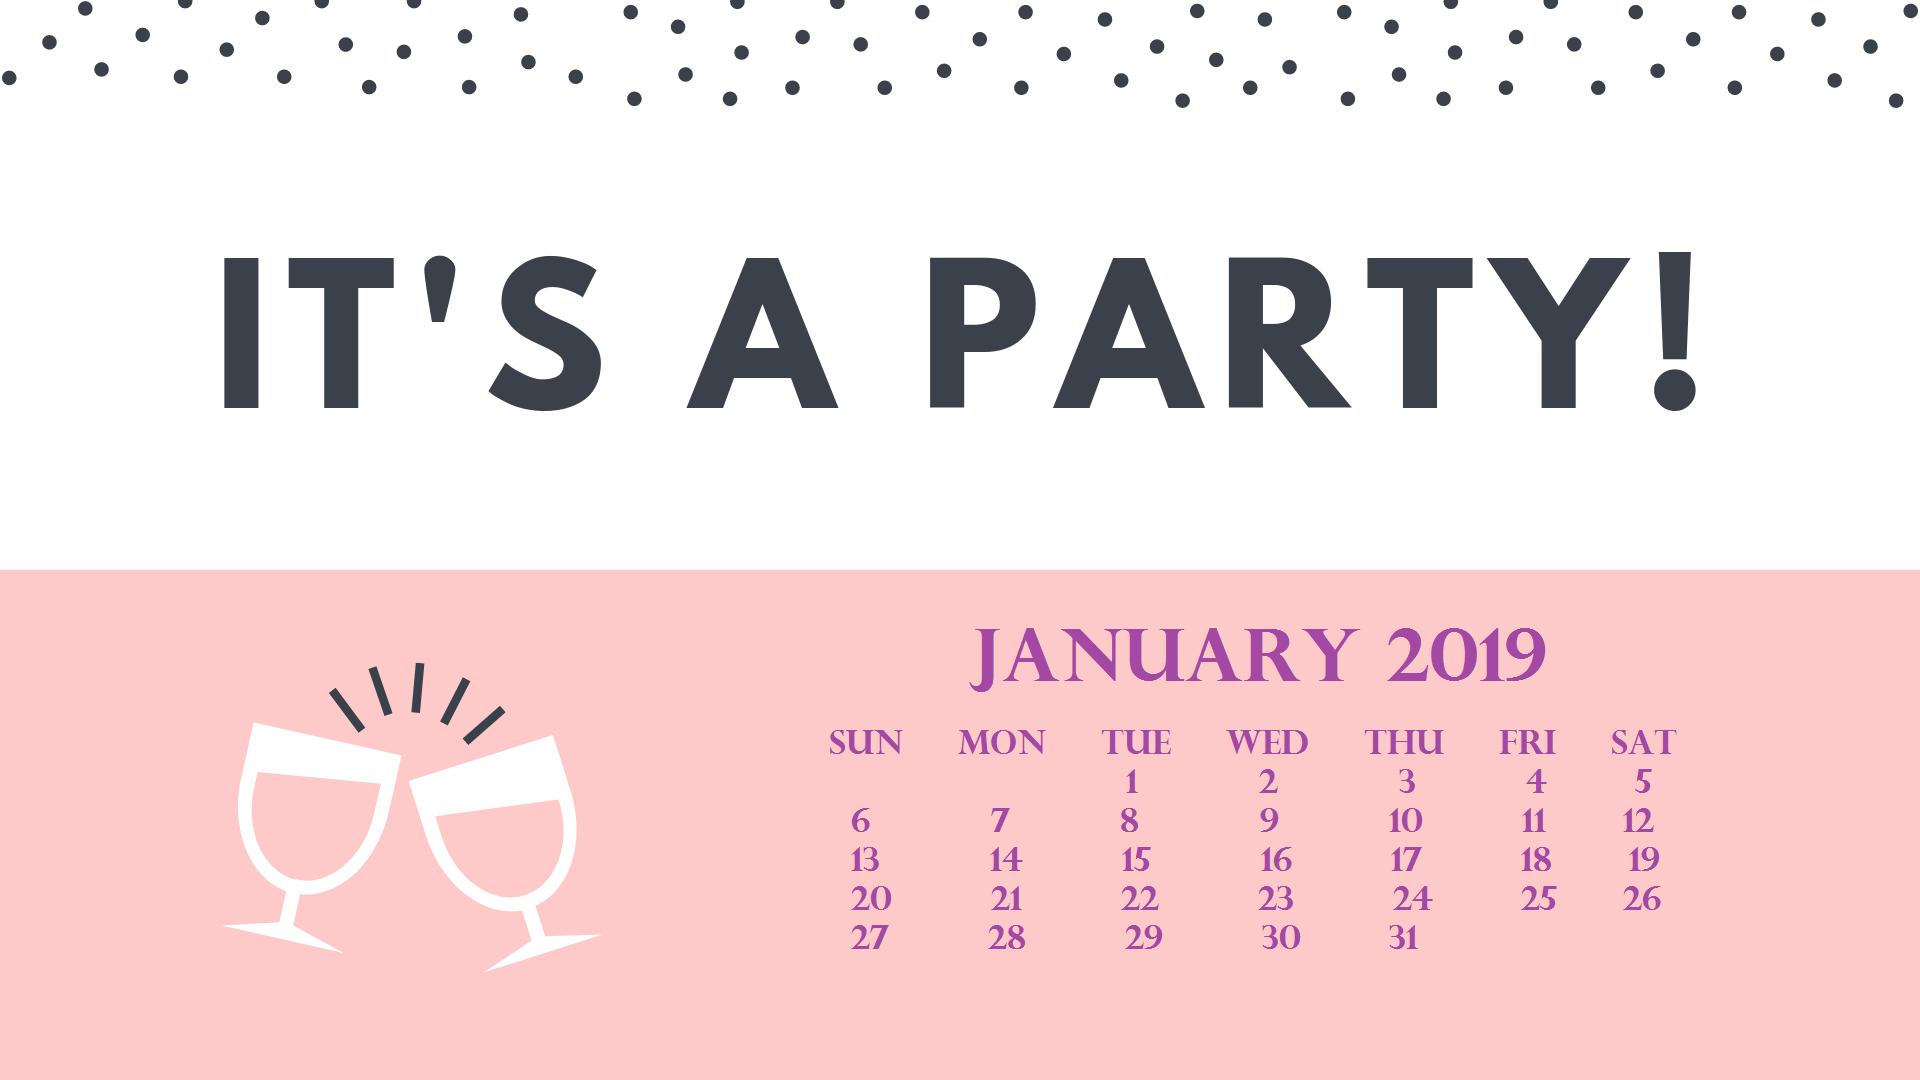 Desktop January 2019 Wallpaper With Calendar